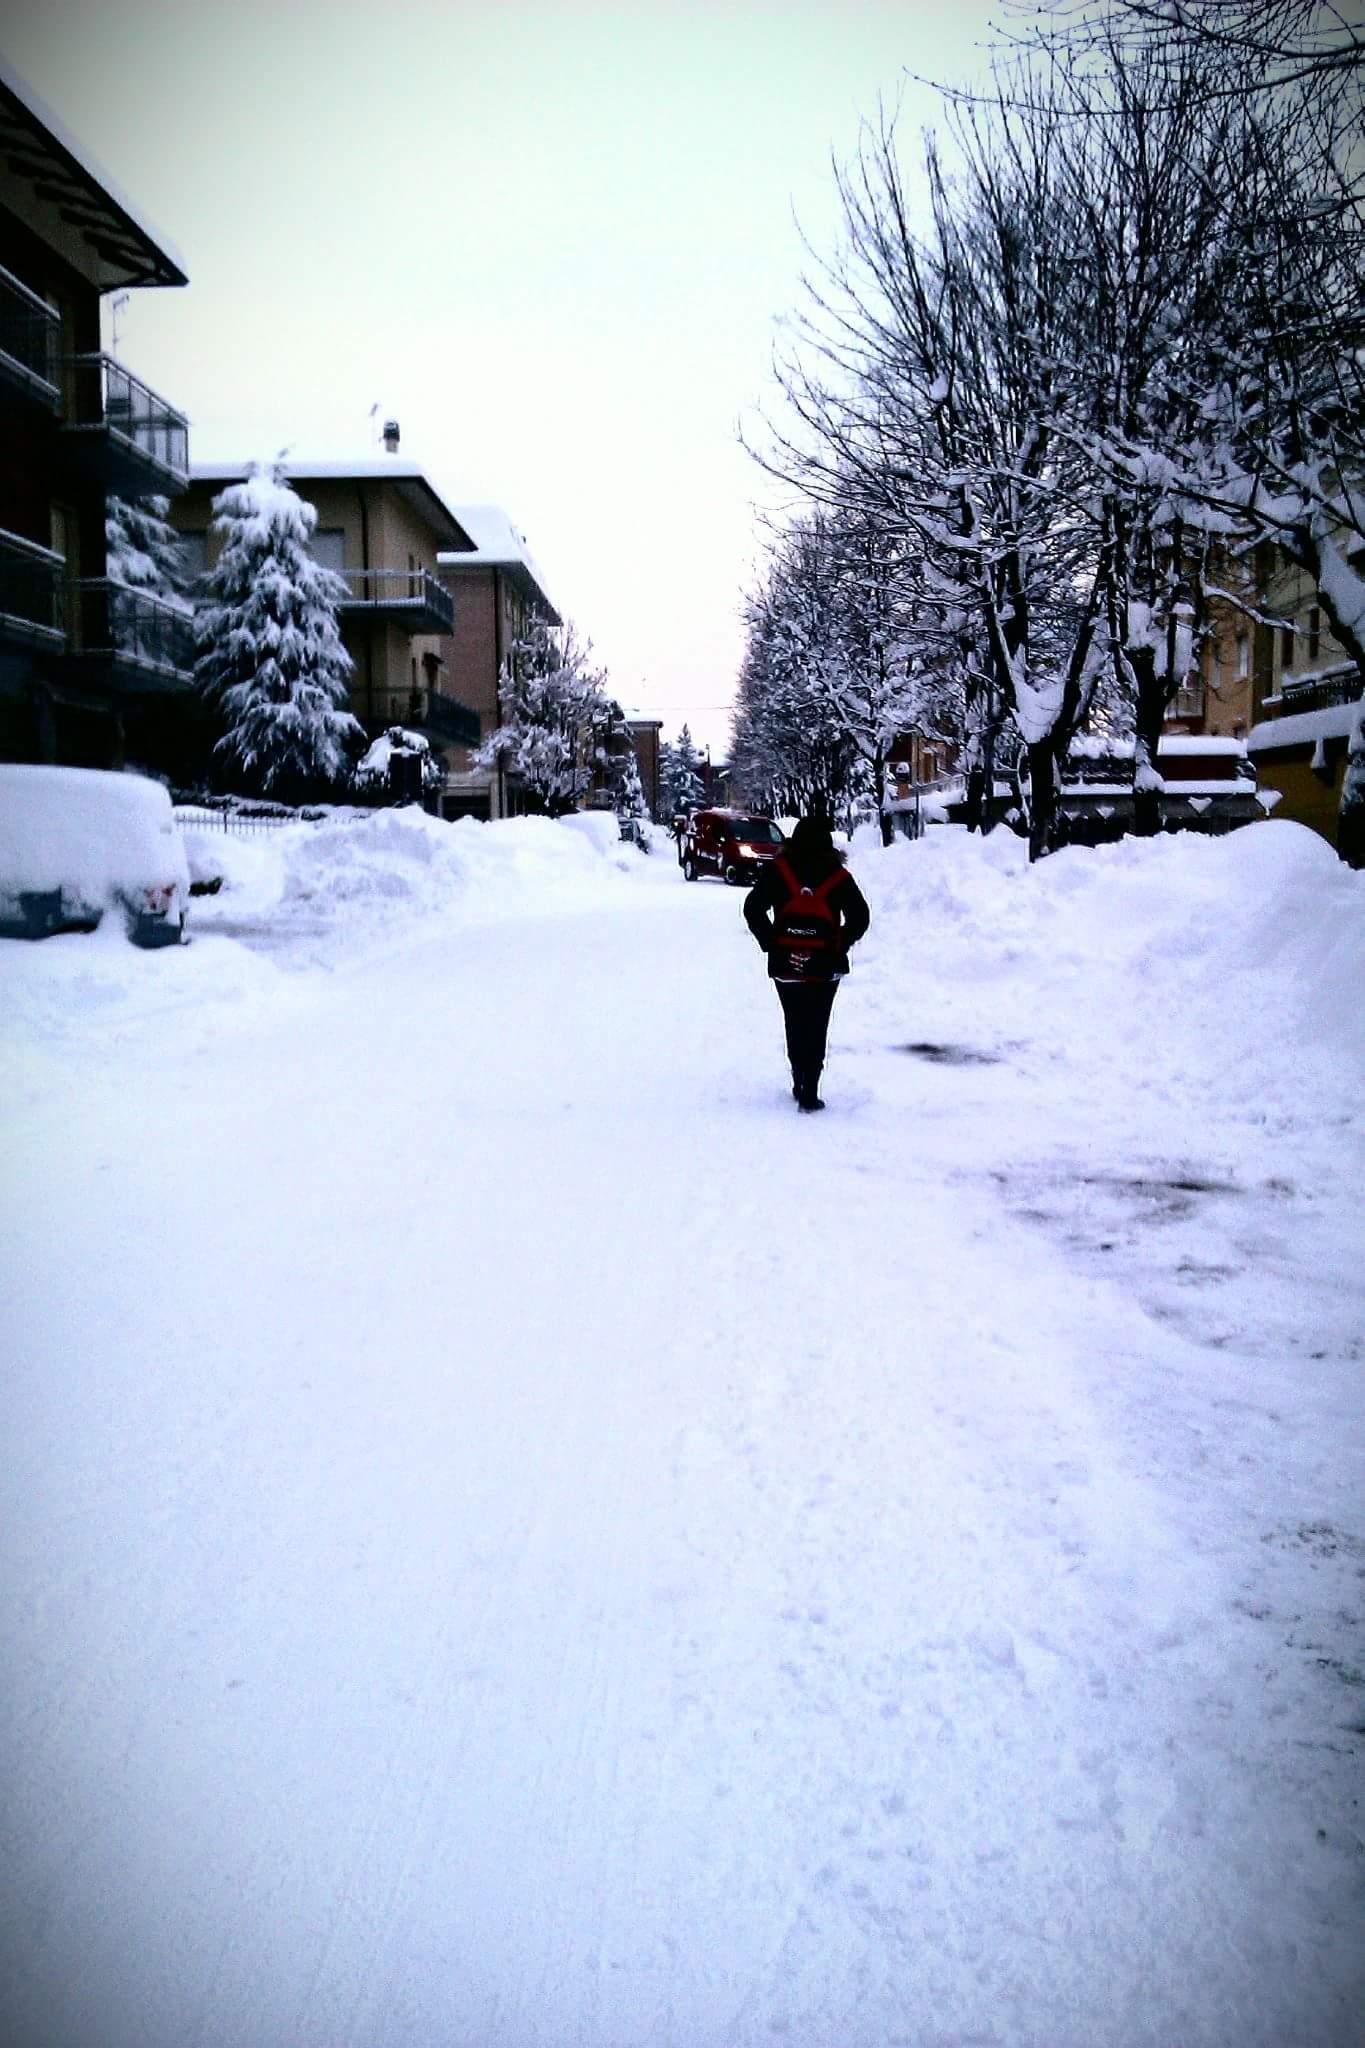 è bastata la neve